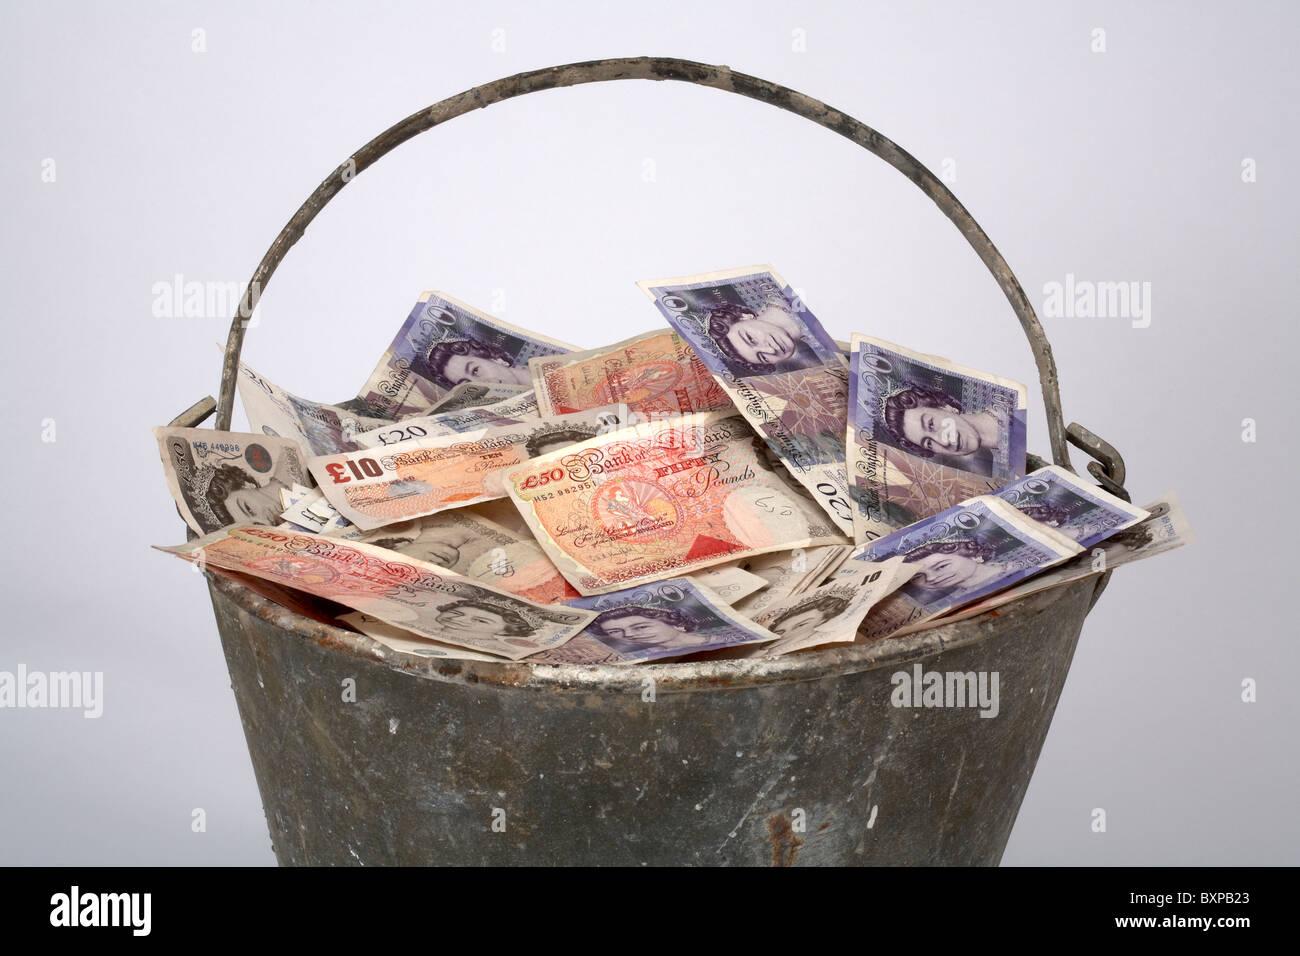 Metal Bucket full of English Currency - Stock Image